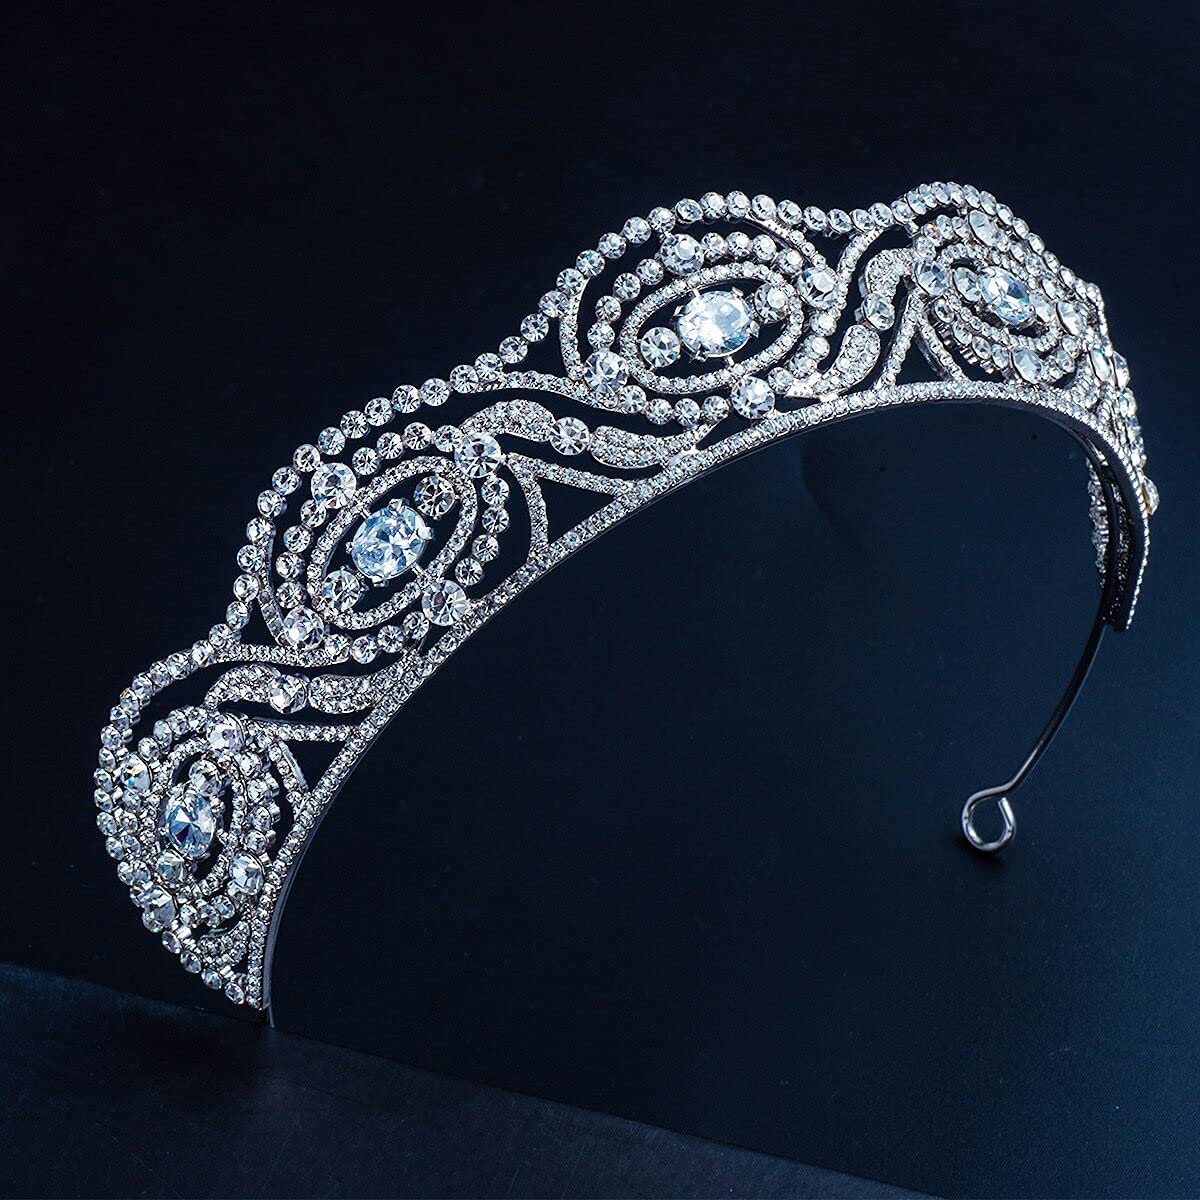 Princess Rhinestones Headband Topics on TV Bridal Low price Crown Al Hair Hoop Glittery